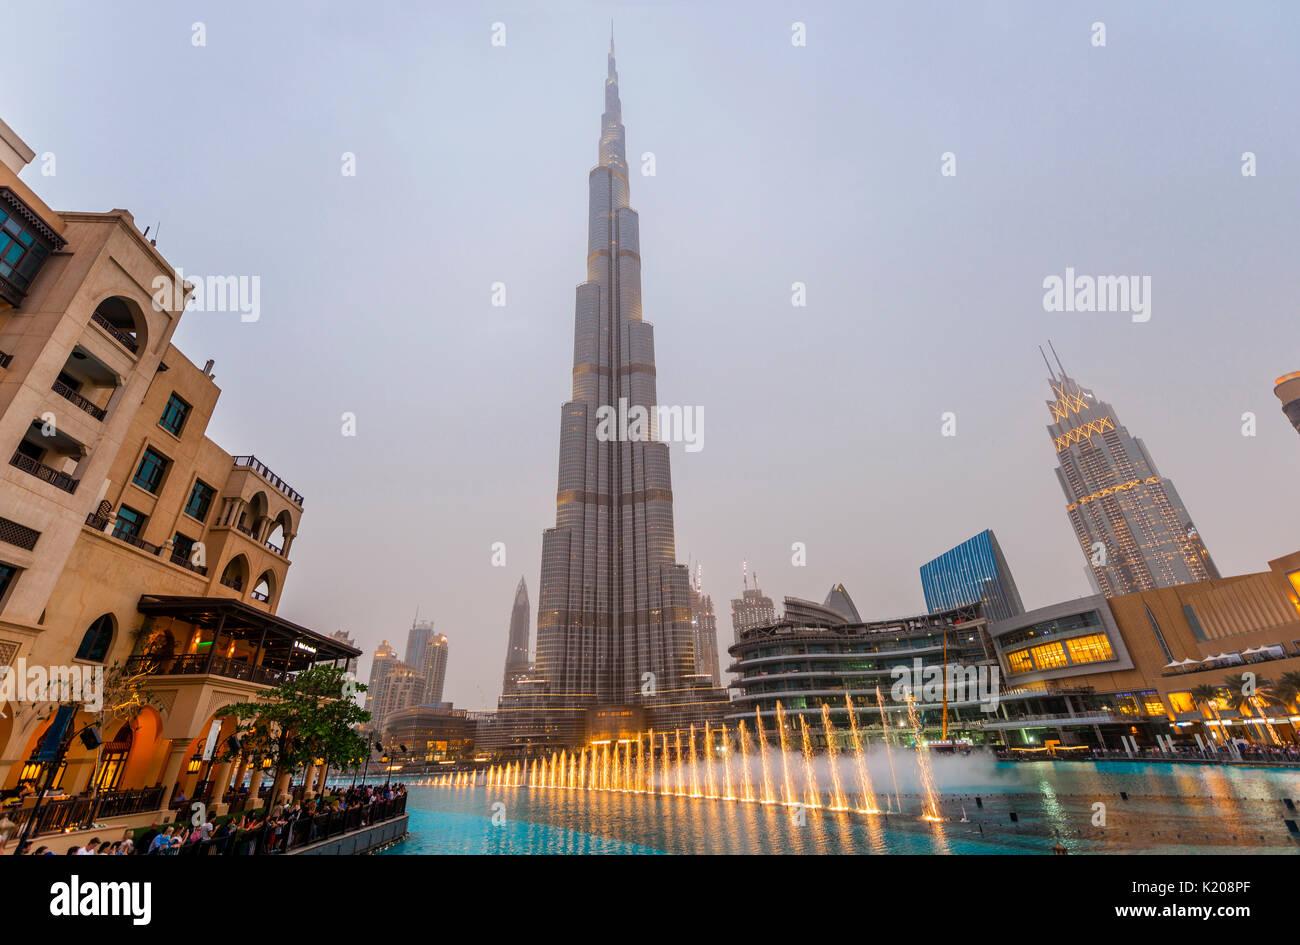 Burj Khalifa, lago artificial con fuente iluminada, Blue Hour, Dubai, Emirato Dubai, Emiratos Árabes Unidos. Foto de stock